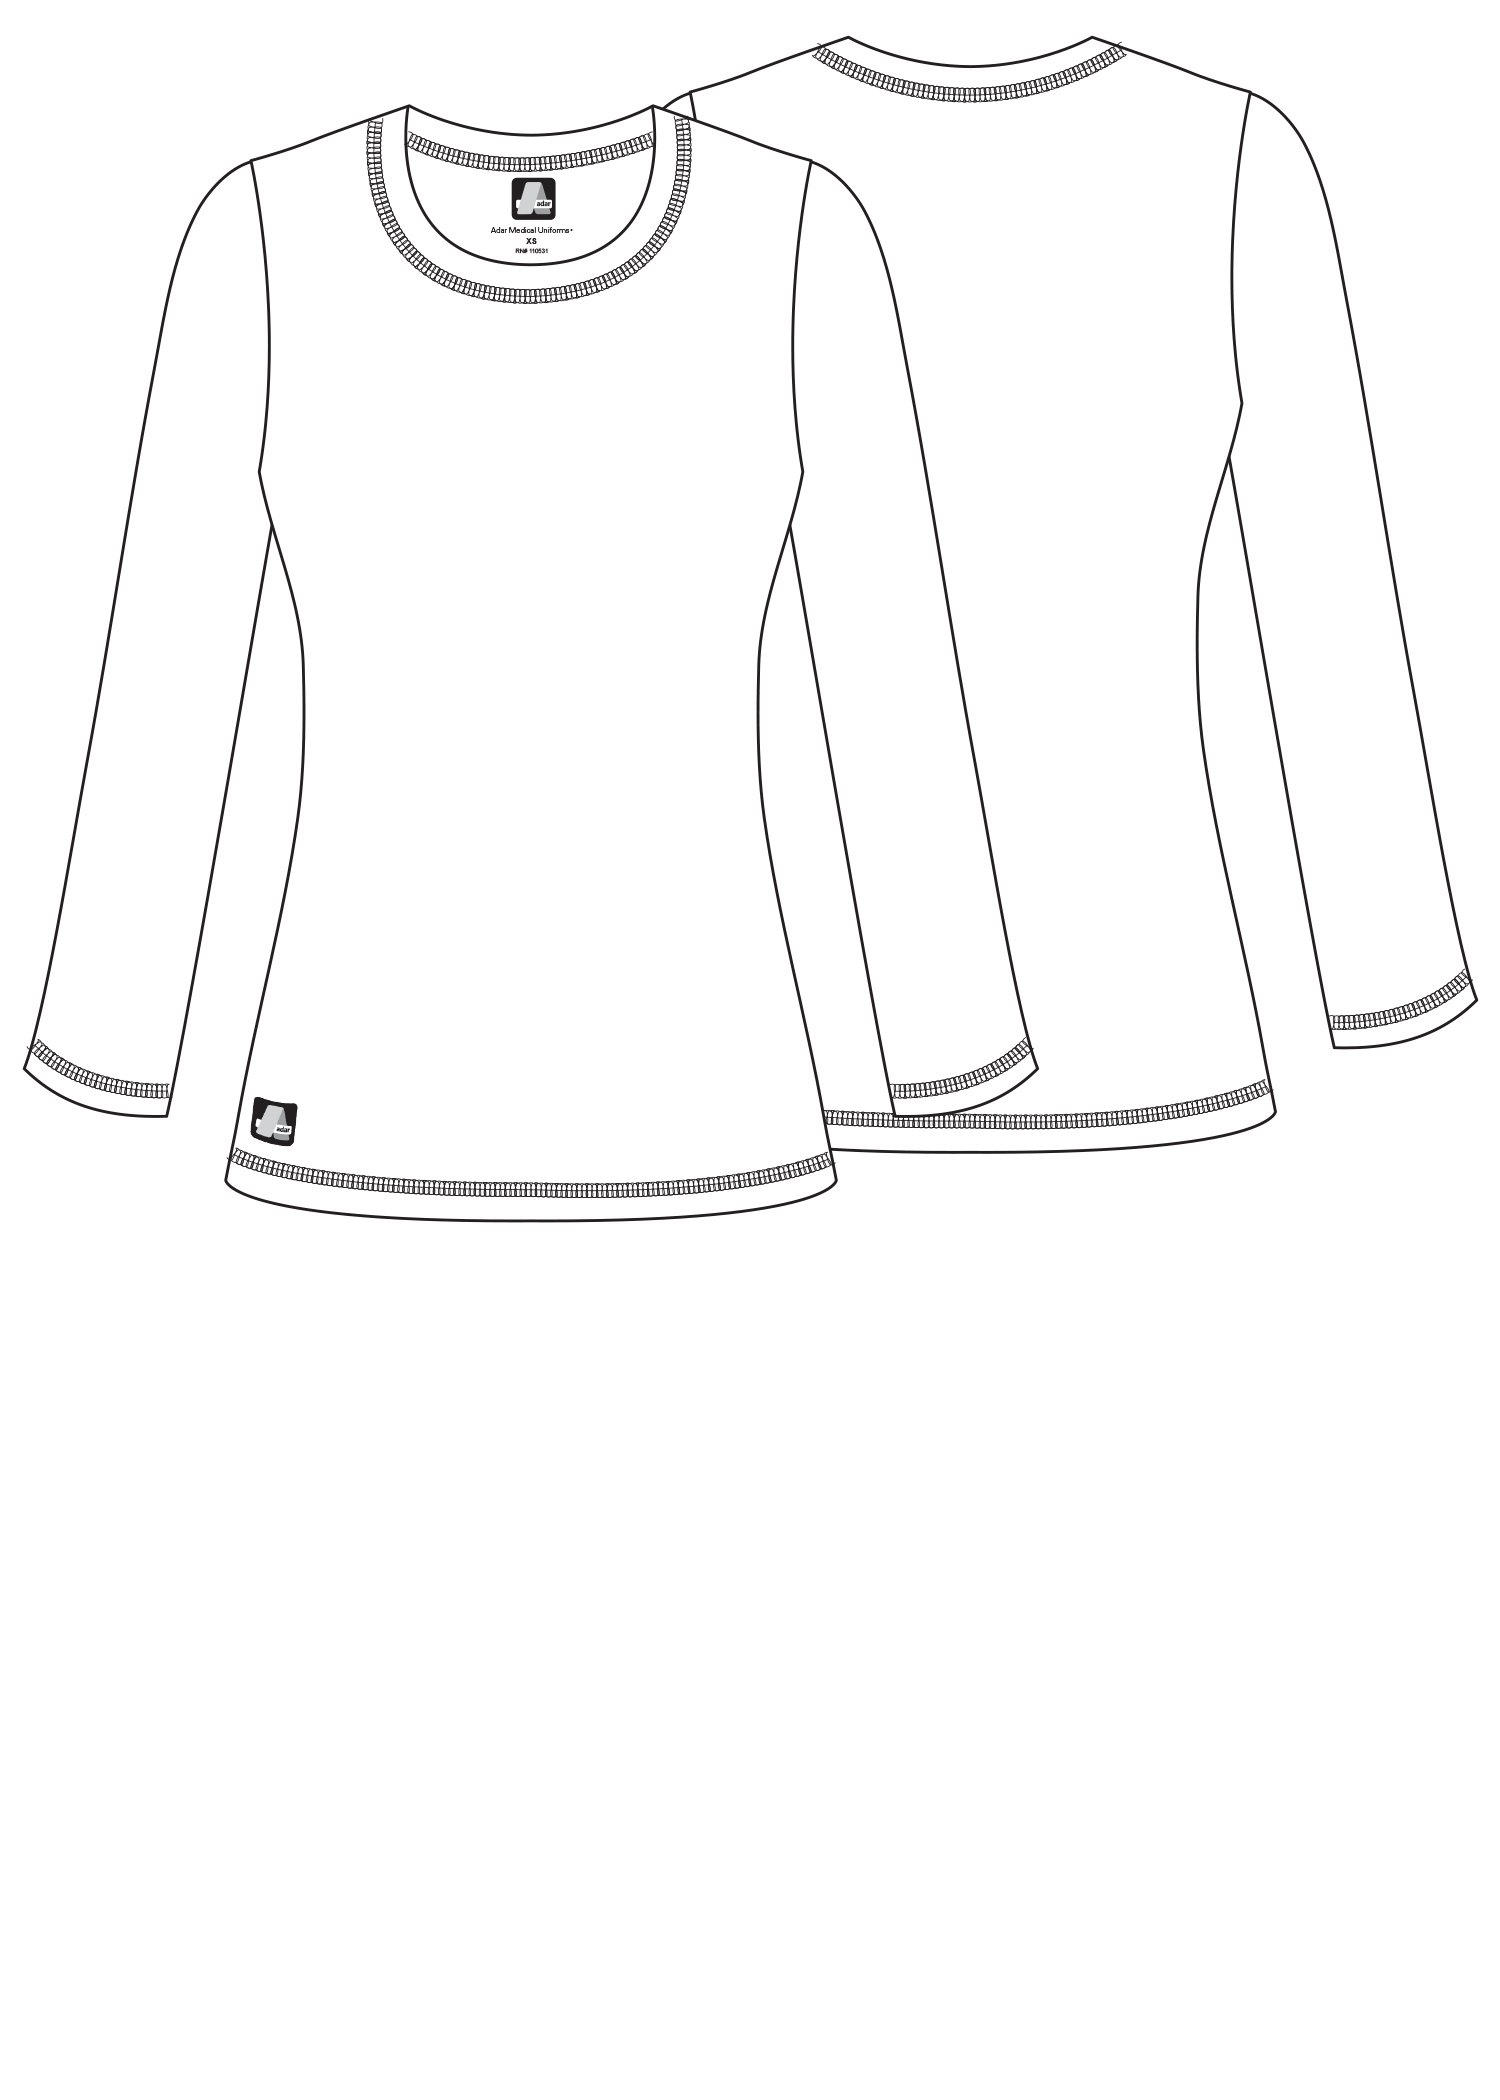 Adar Womens Comfort Long Sleeve Fitted T-Shirt Underscrub Tee- 3400 - Royal Blue - L by ADAR UNIFORMS (Image #6)